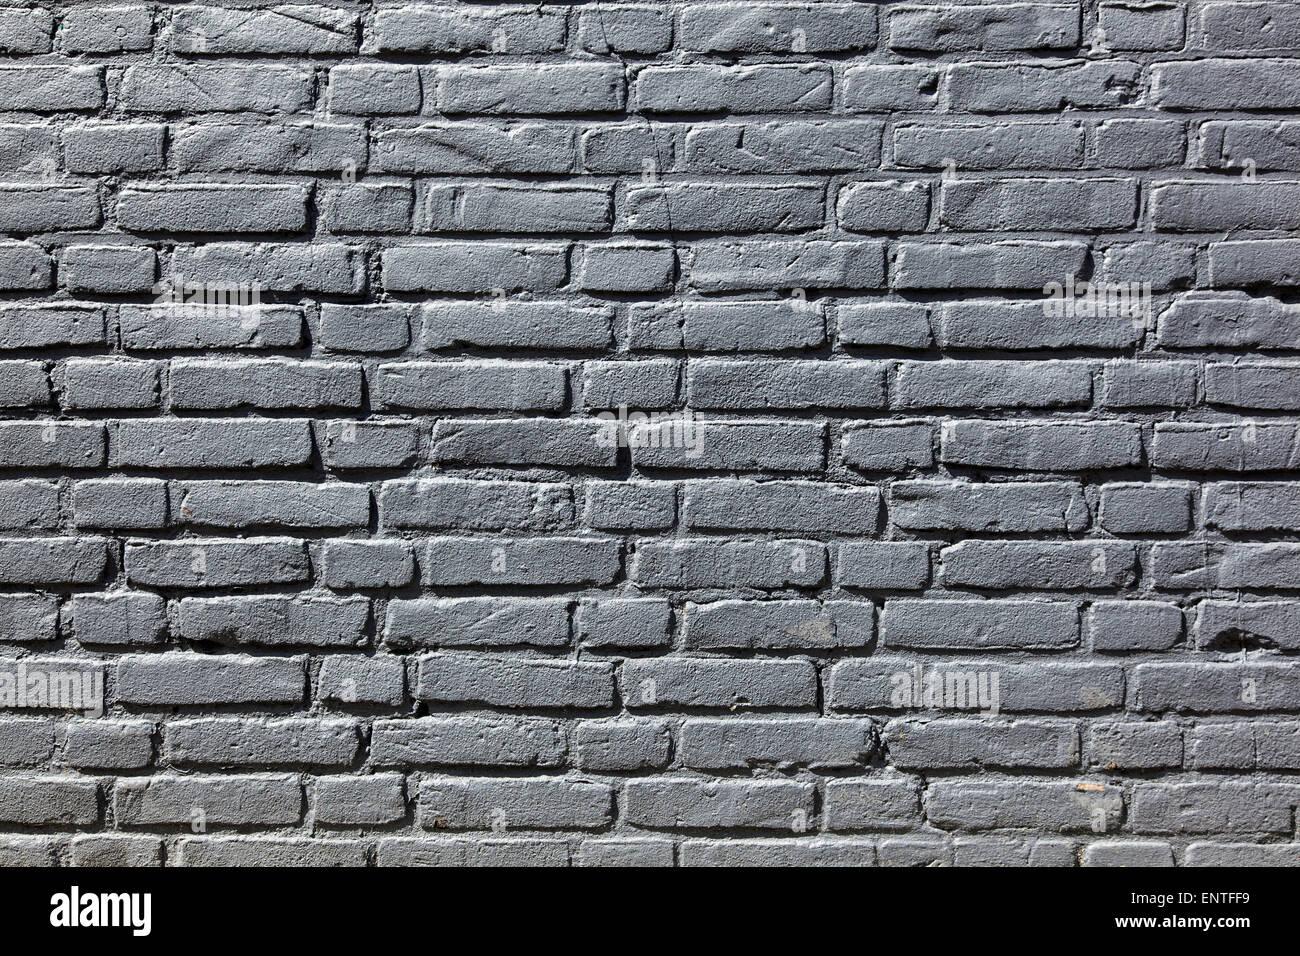 horozontal part of gray painted brick wall - Stock Image